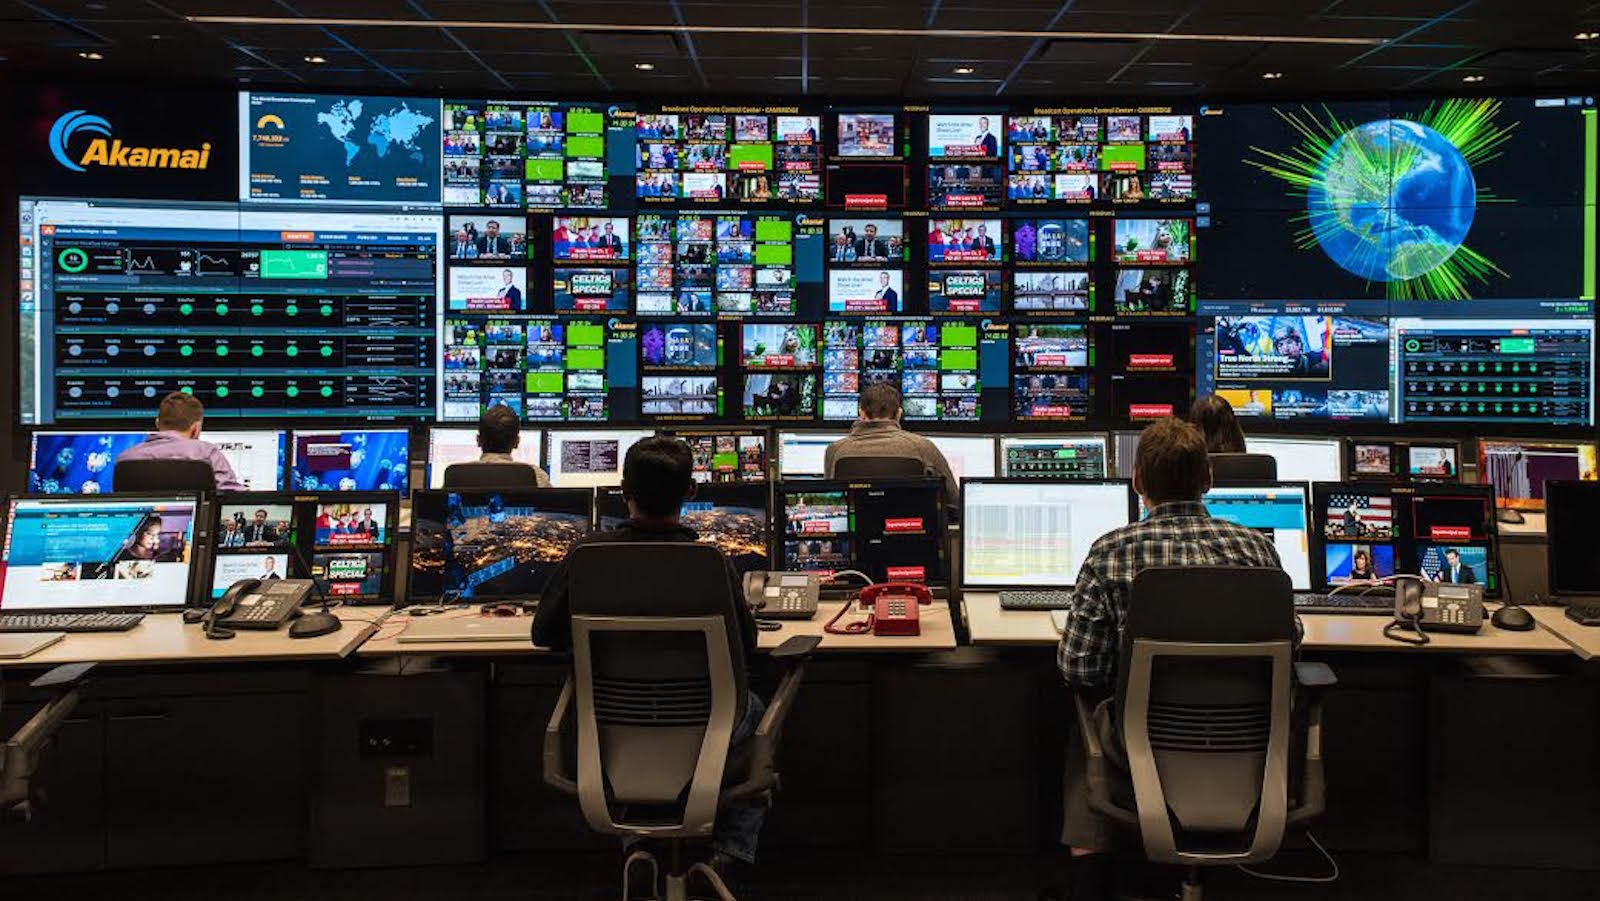 Akamai's Broadcast Operations Center in Cambridge, Massachusetts